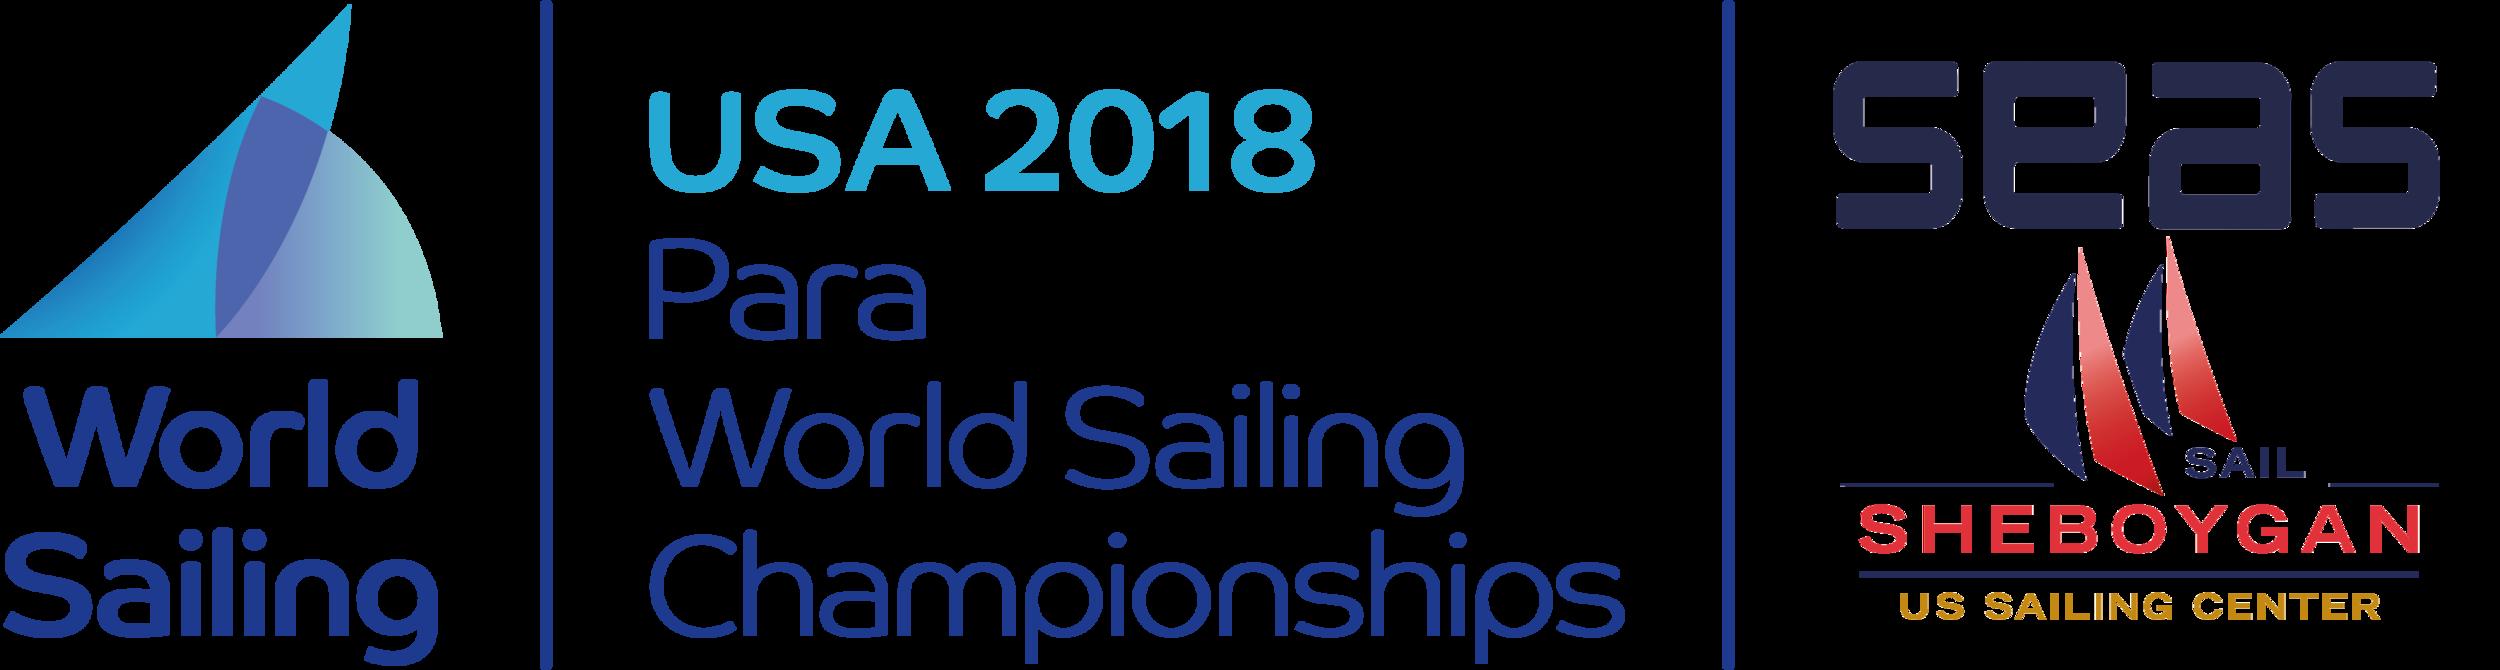 Pa_World Sailing Championship_BlendedColour_landscape_WithVenue_USA2018.png